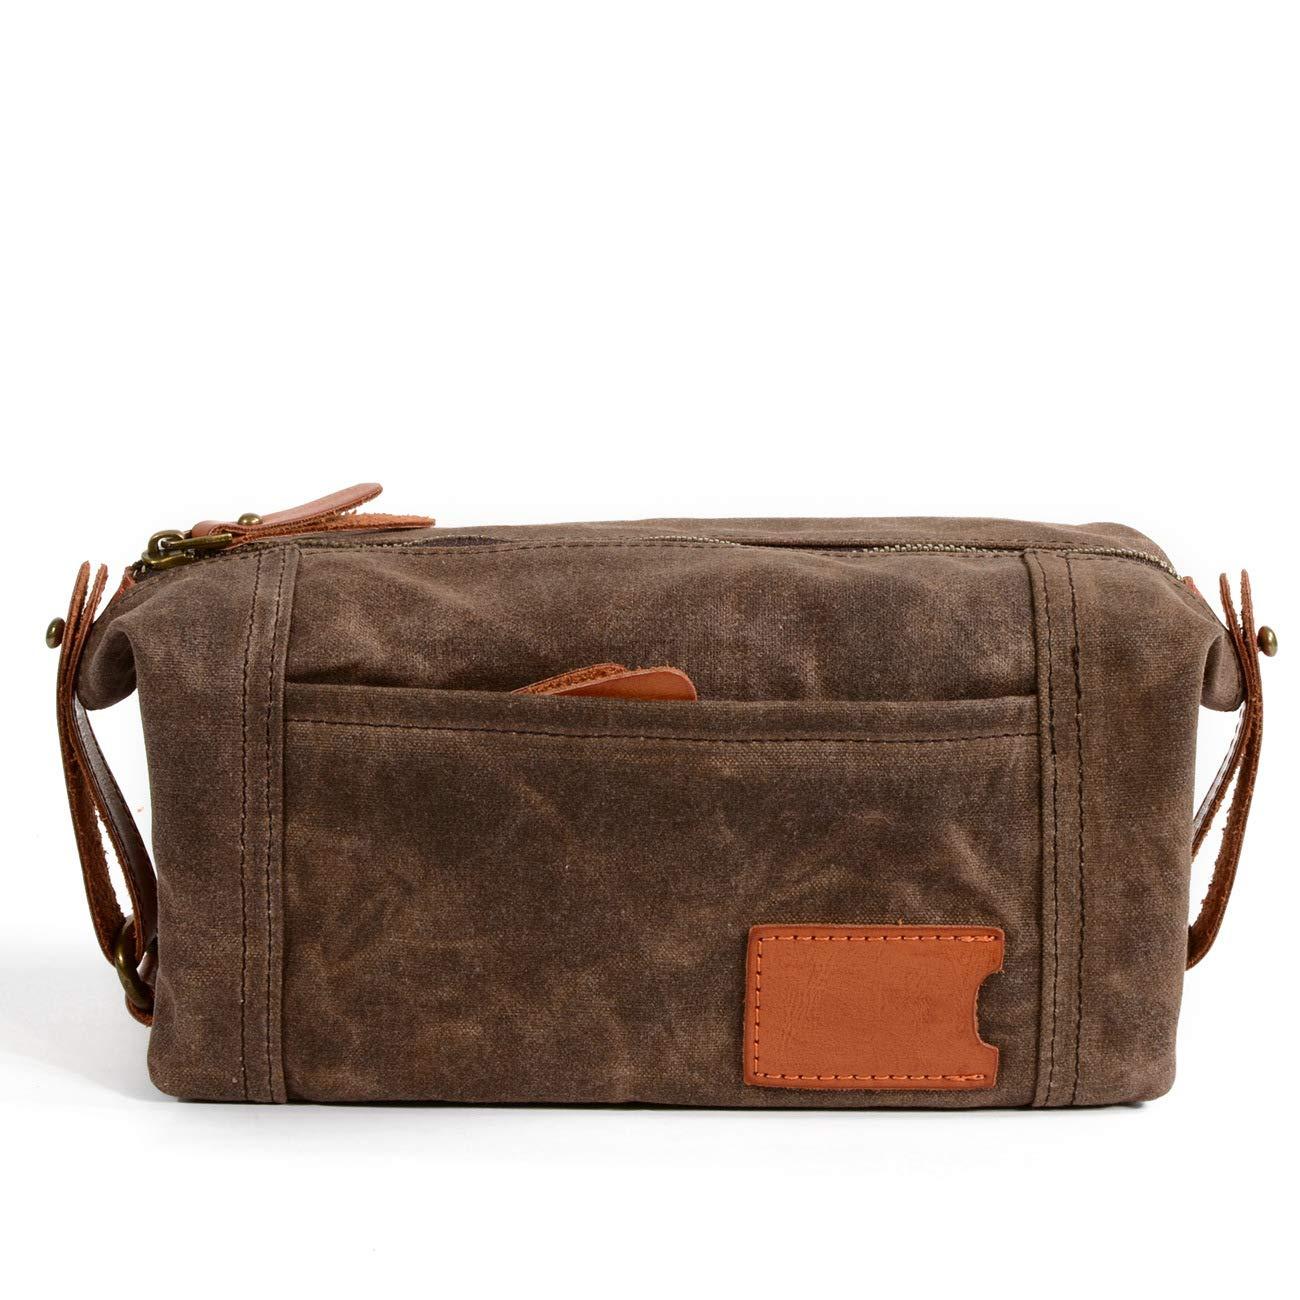 Multifunction Wax Canvas and Leather Bag,wash Bag,Travel wallet6111 Dark Grey